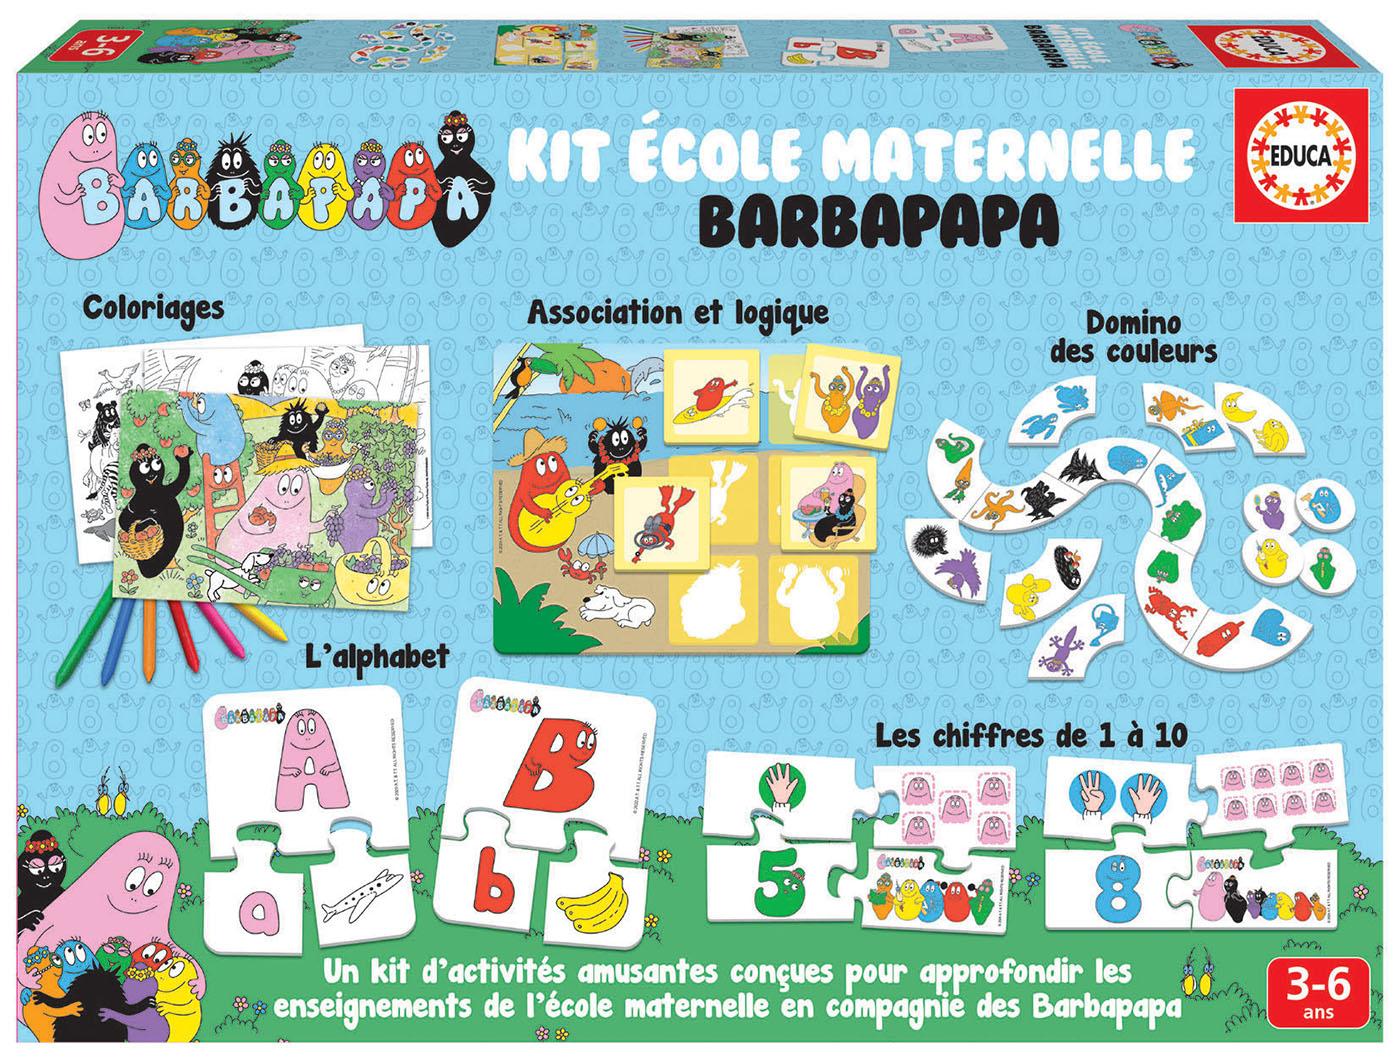 Kit ecole maternelle barbapapa